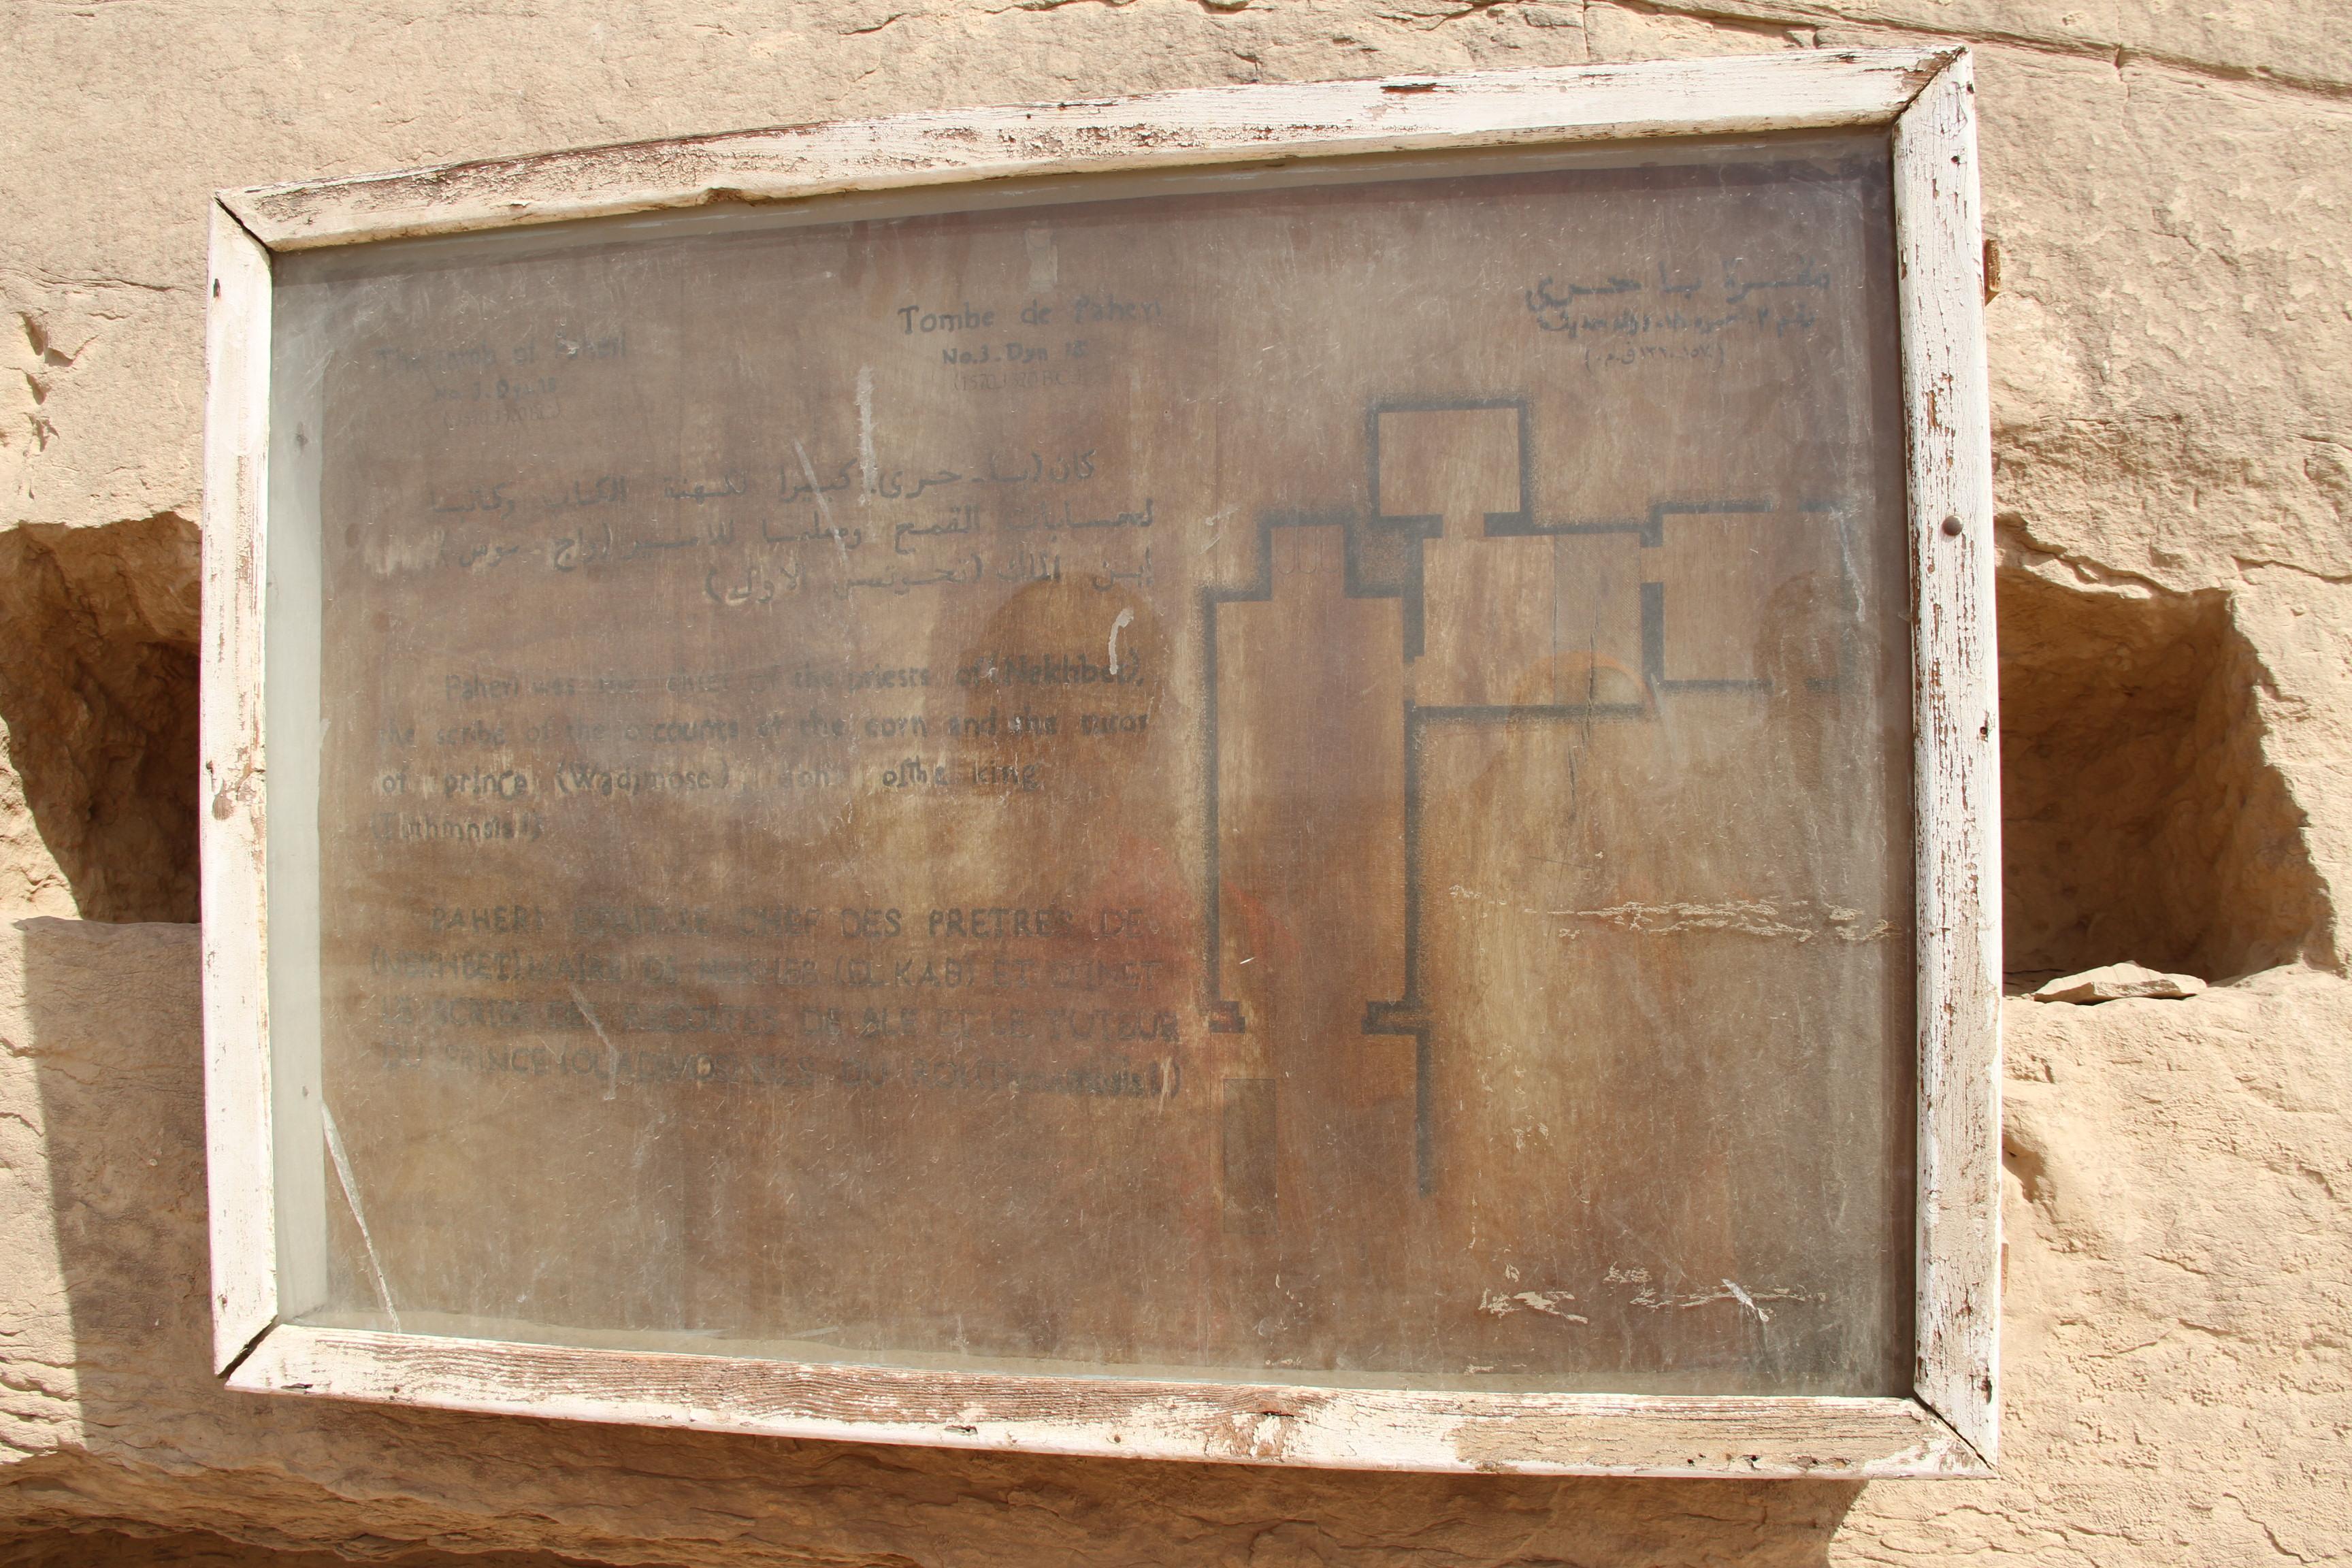 Табличка угробницы вЭль-Кабе